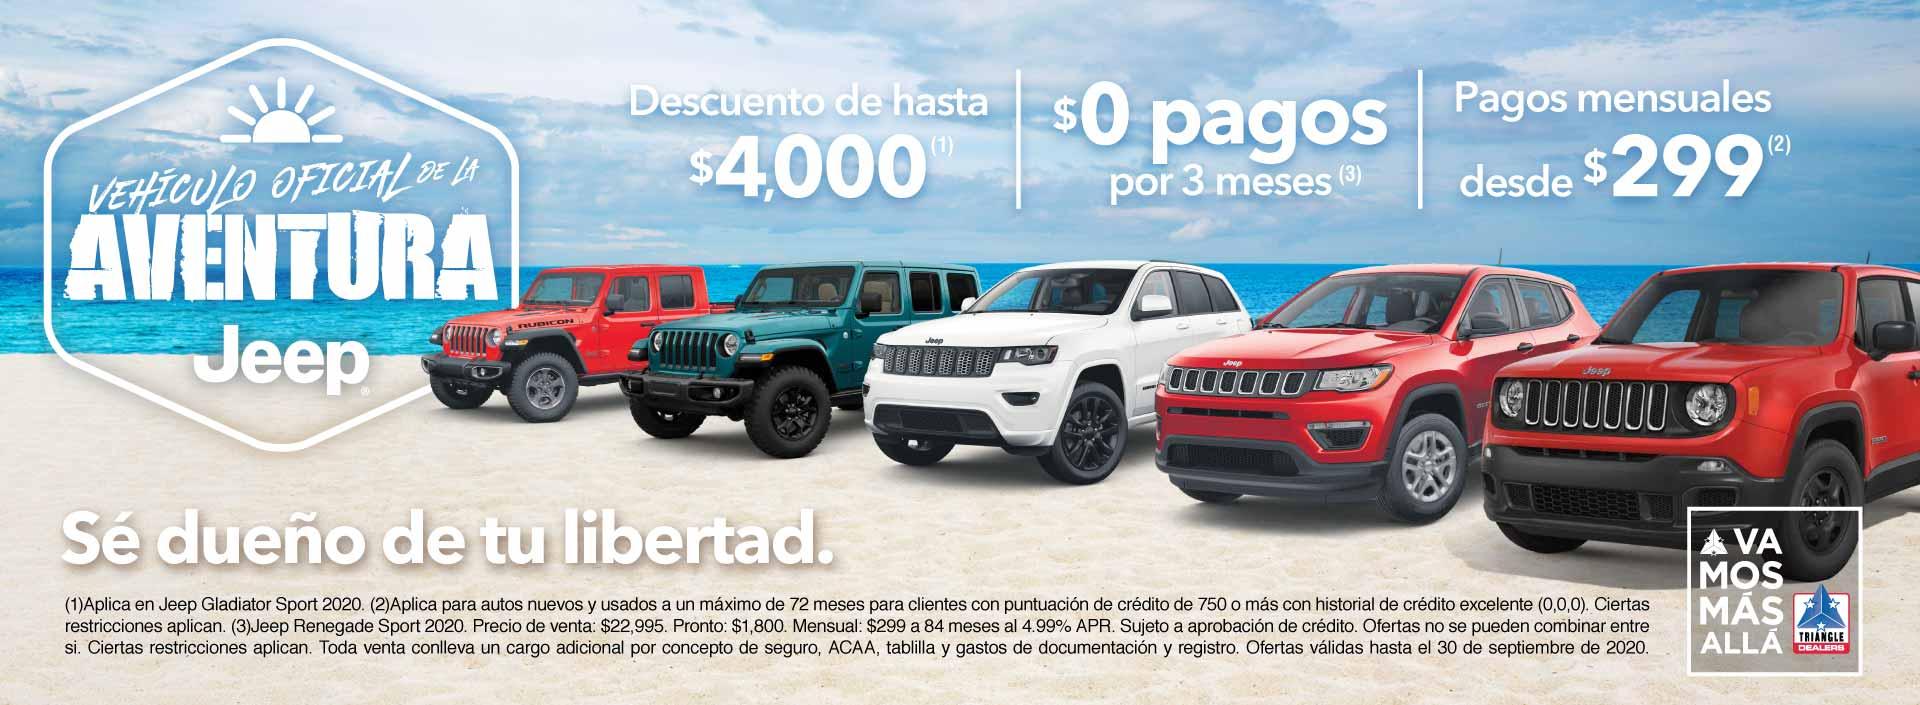 T.ChryslerOeste_Aventura_1920x705_Español